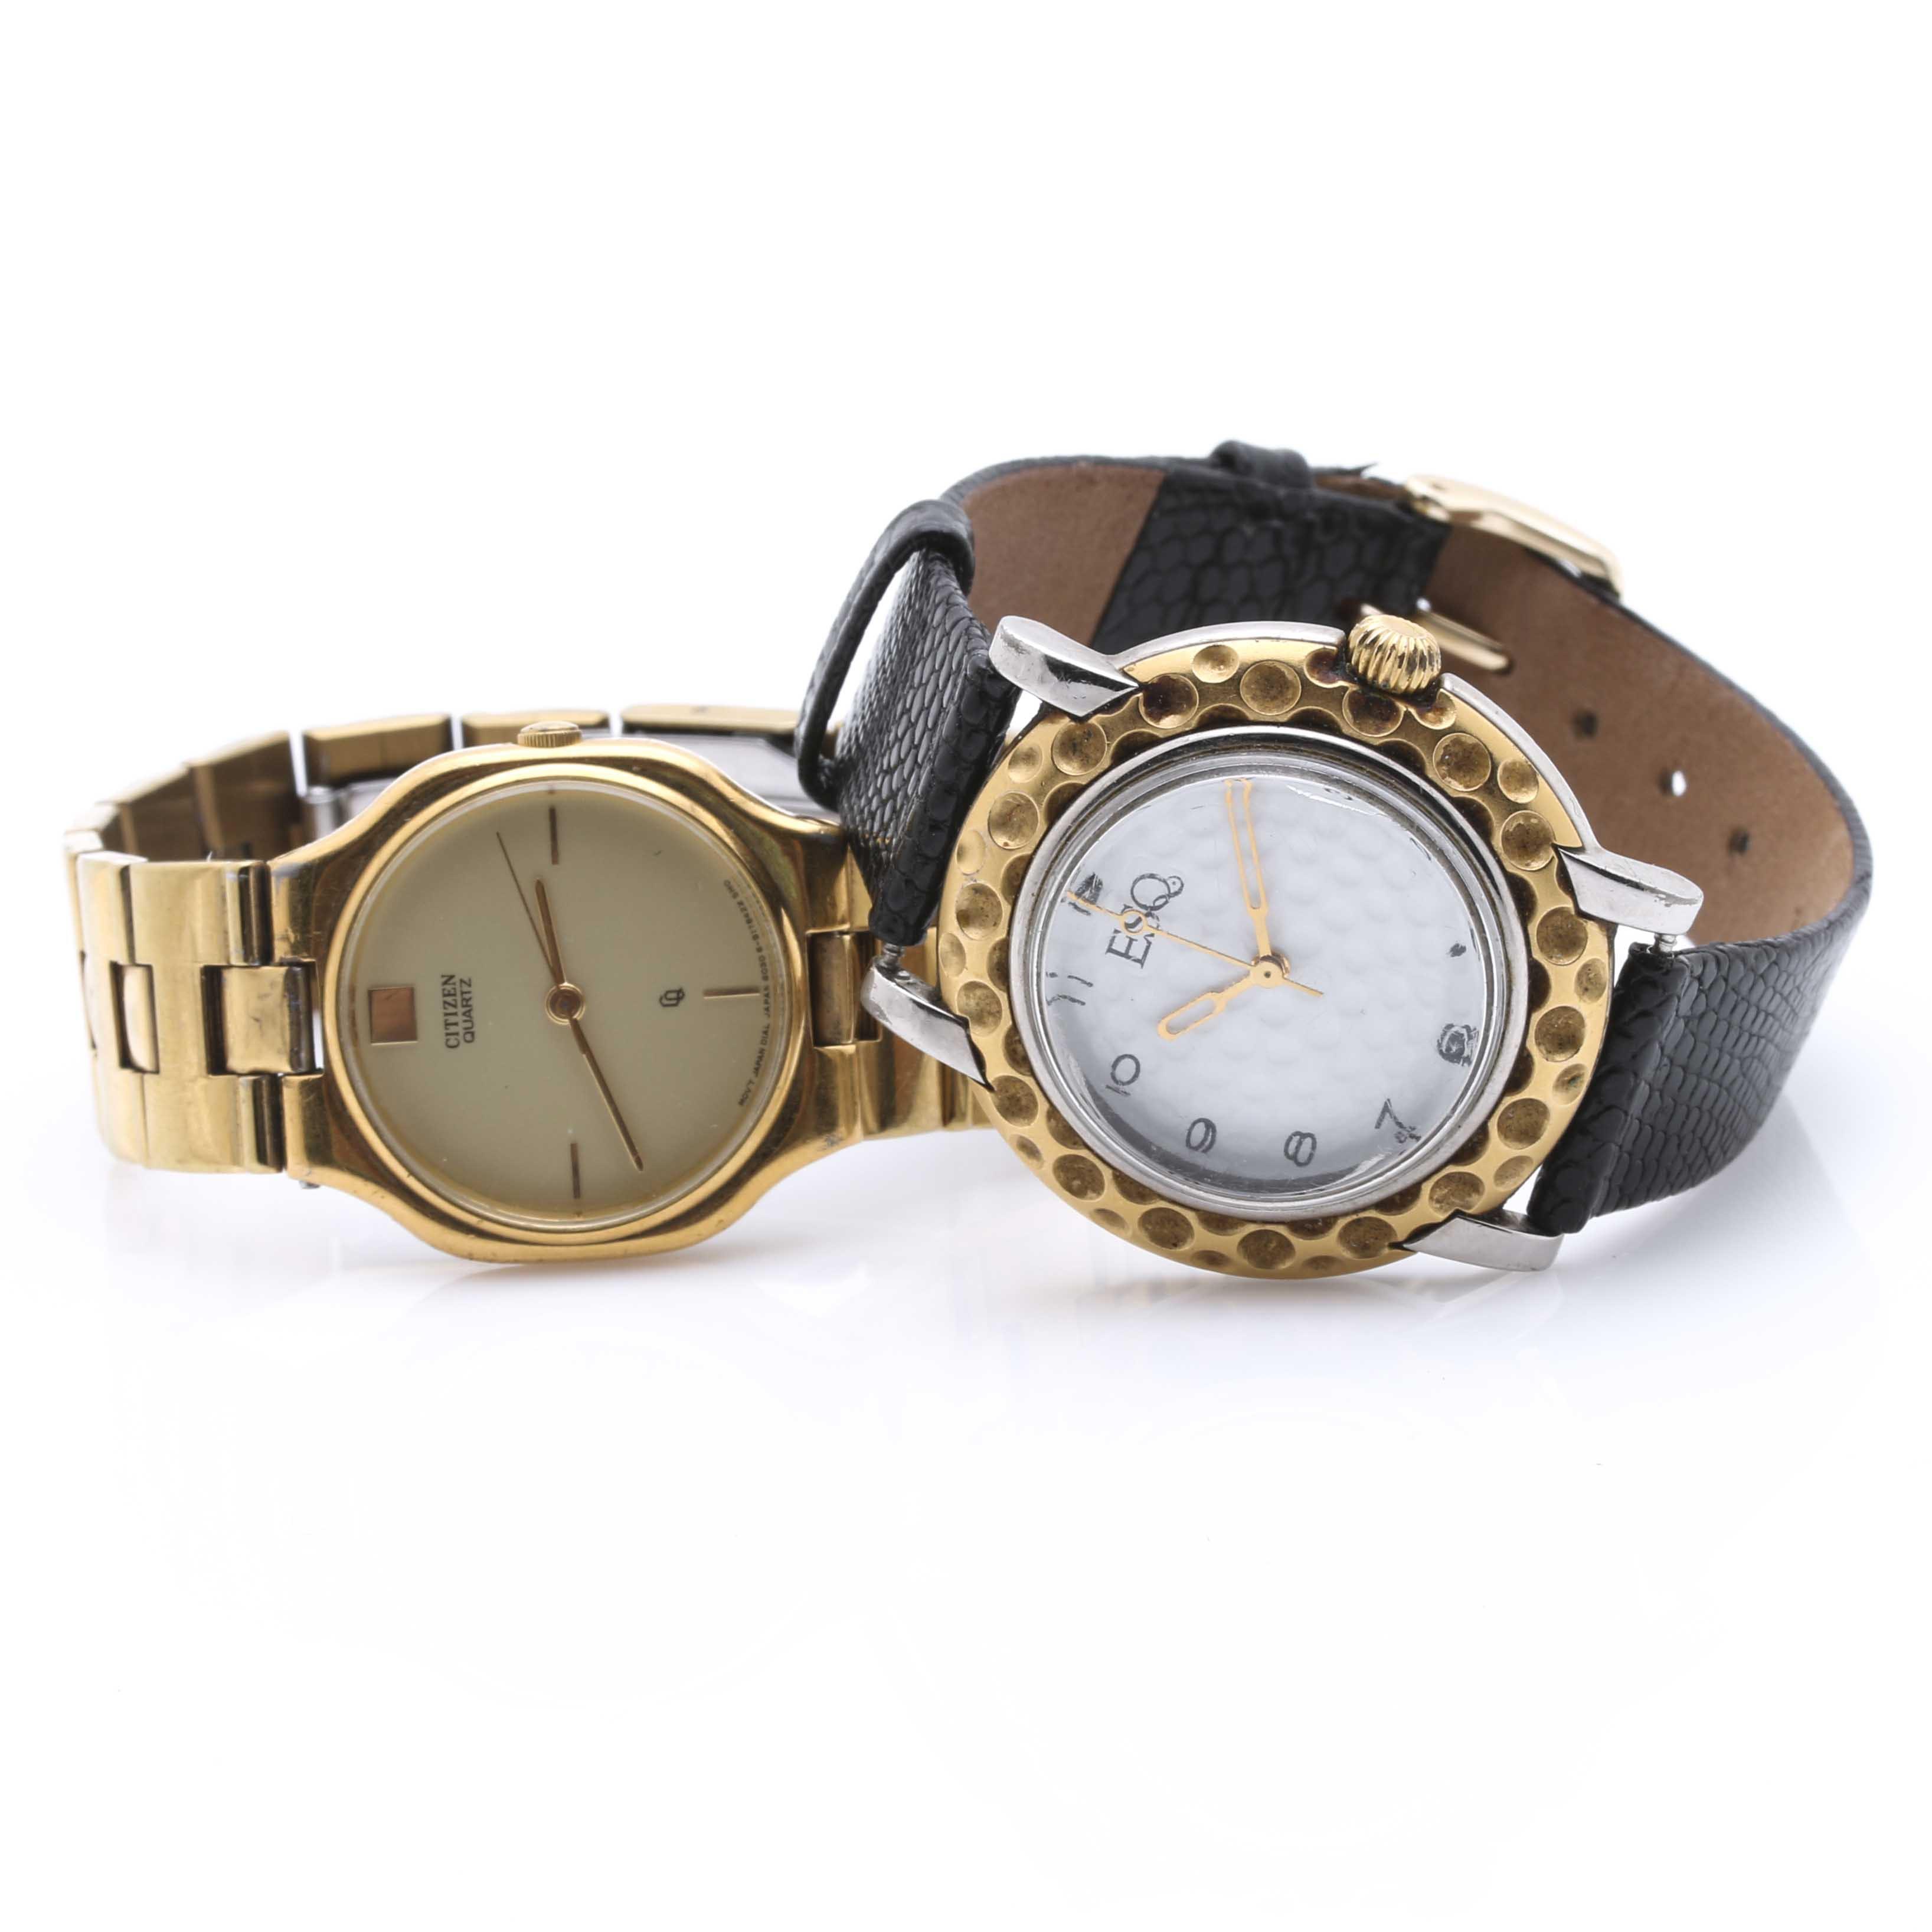 Esquire and Citizen Quartz Wristwatches